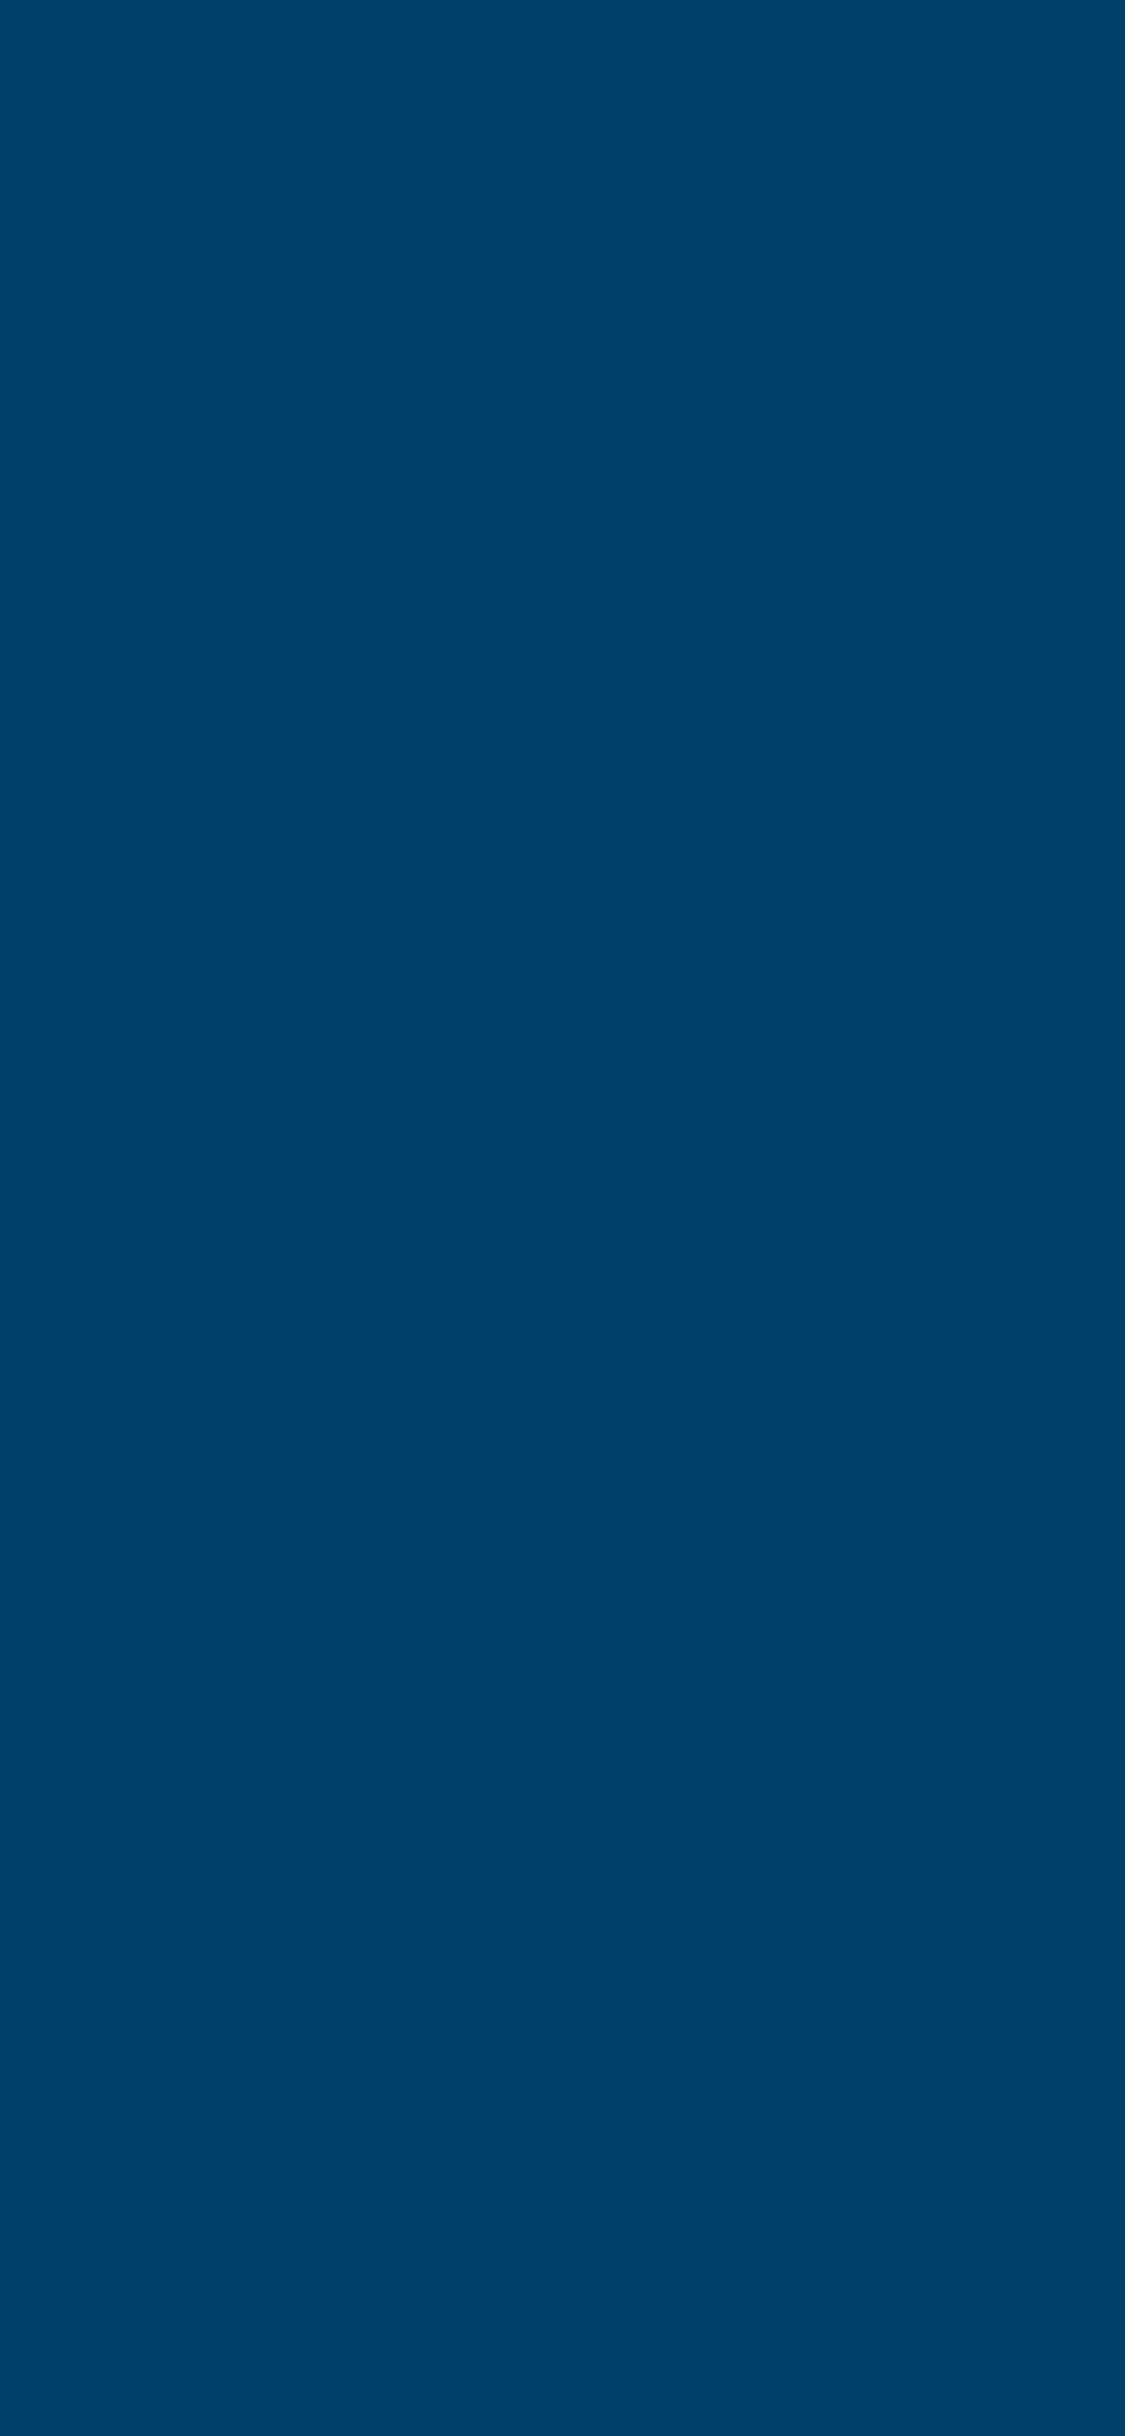 1125x2436 Indigo Dye Solid Color Background